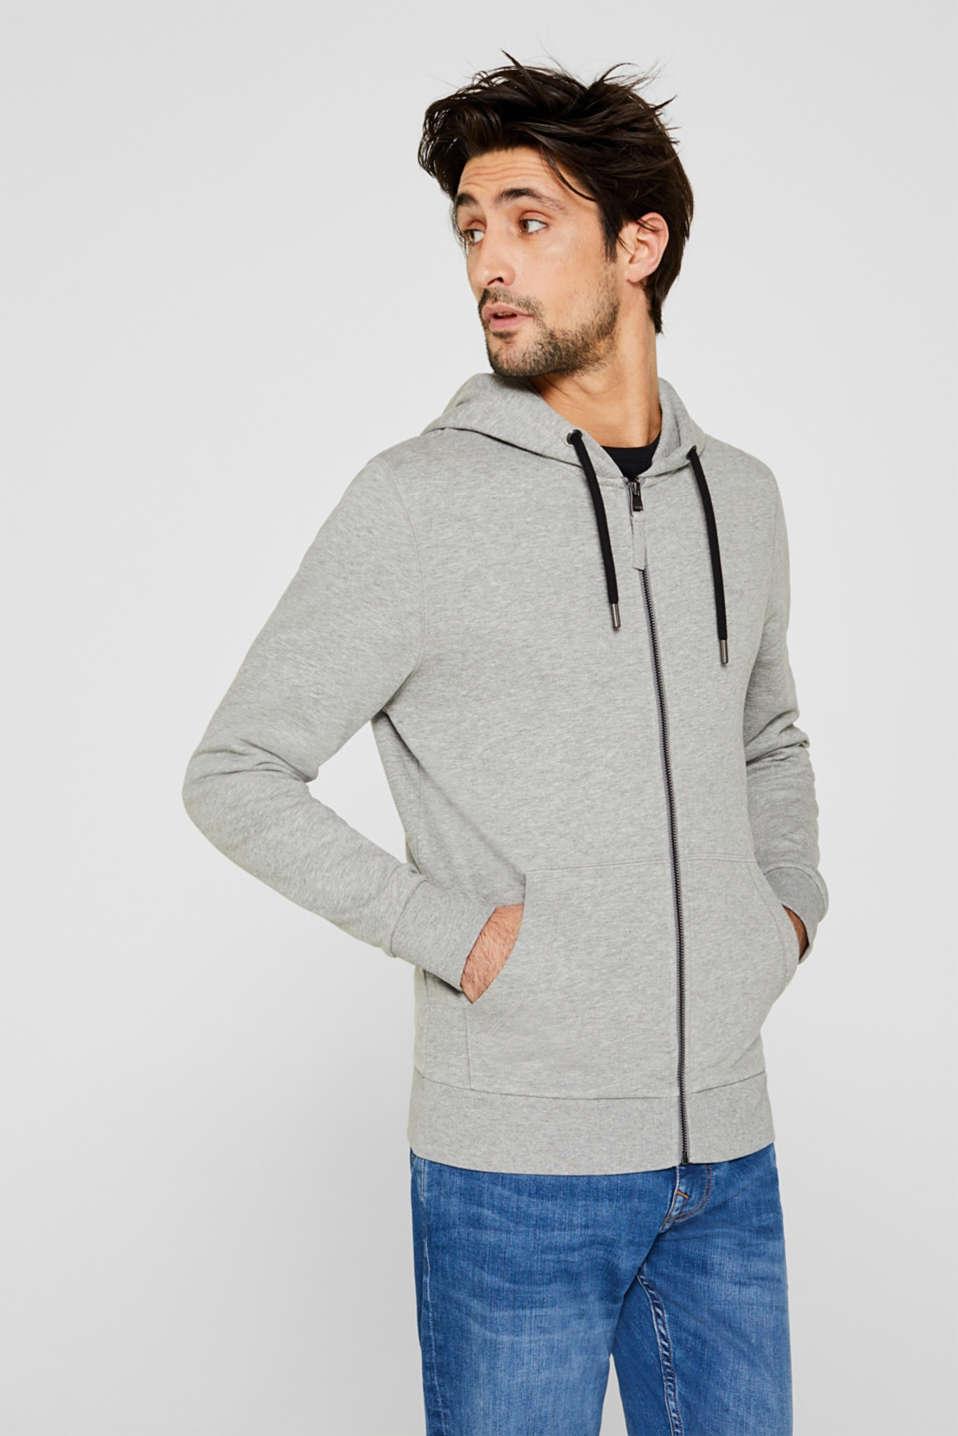 Hooded sweatshirt cardigan, MEDIUM GREY 5, detail image number 4